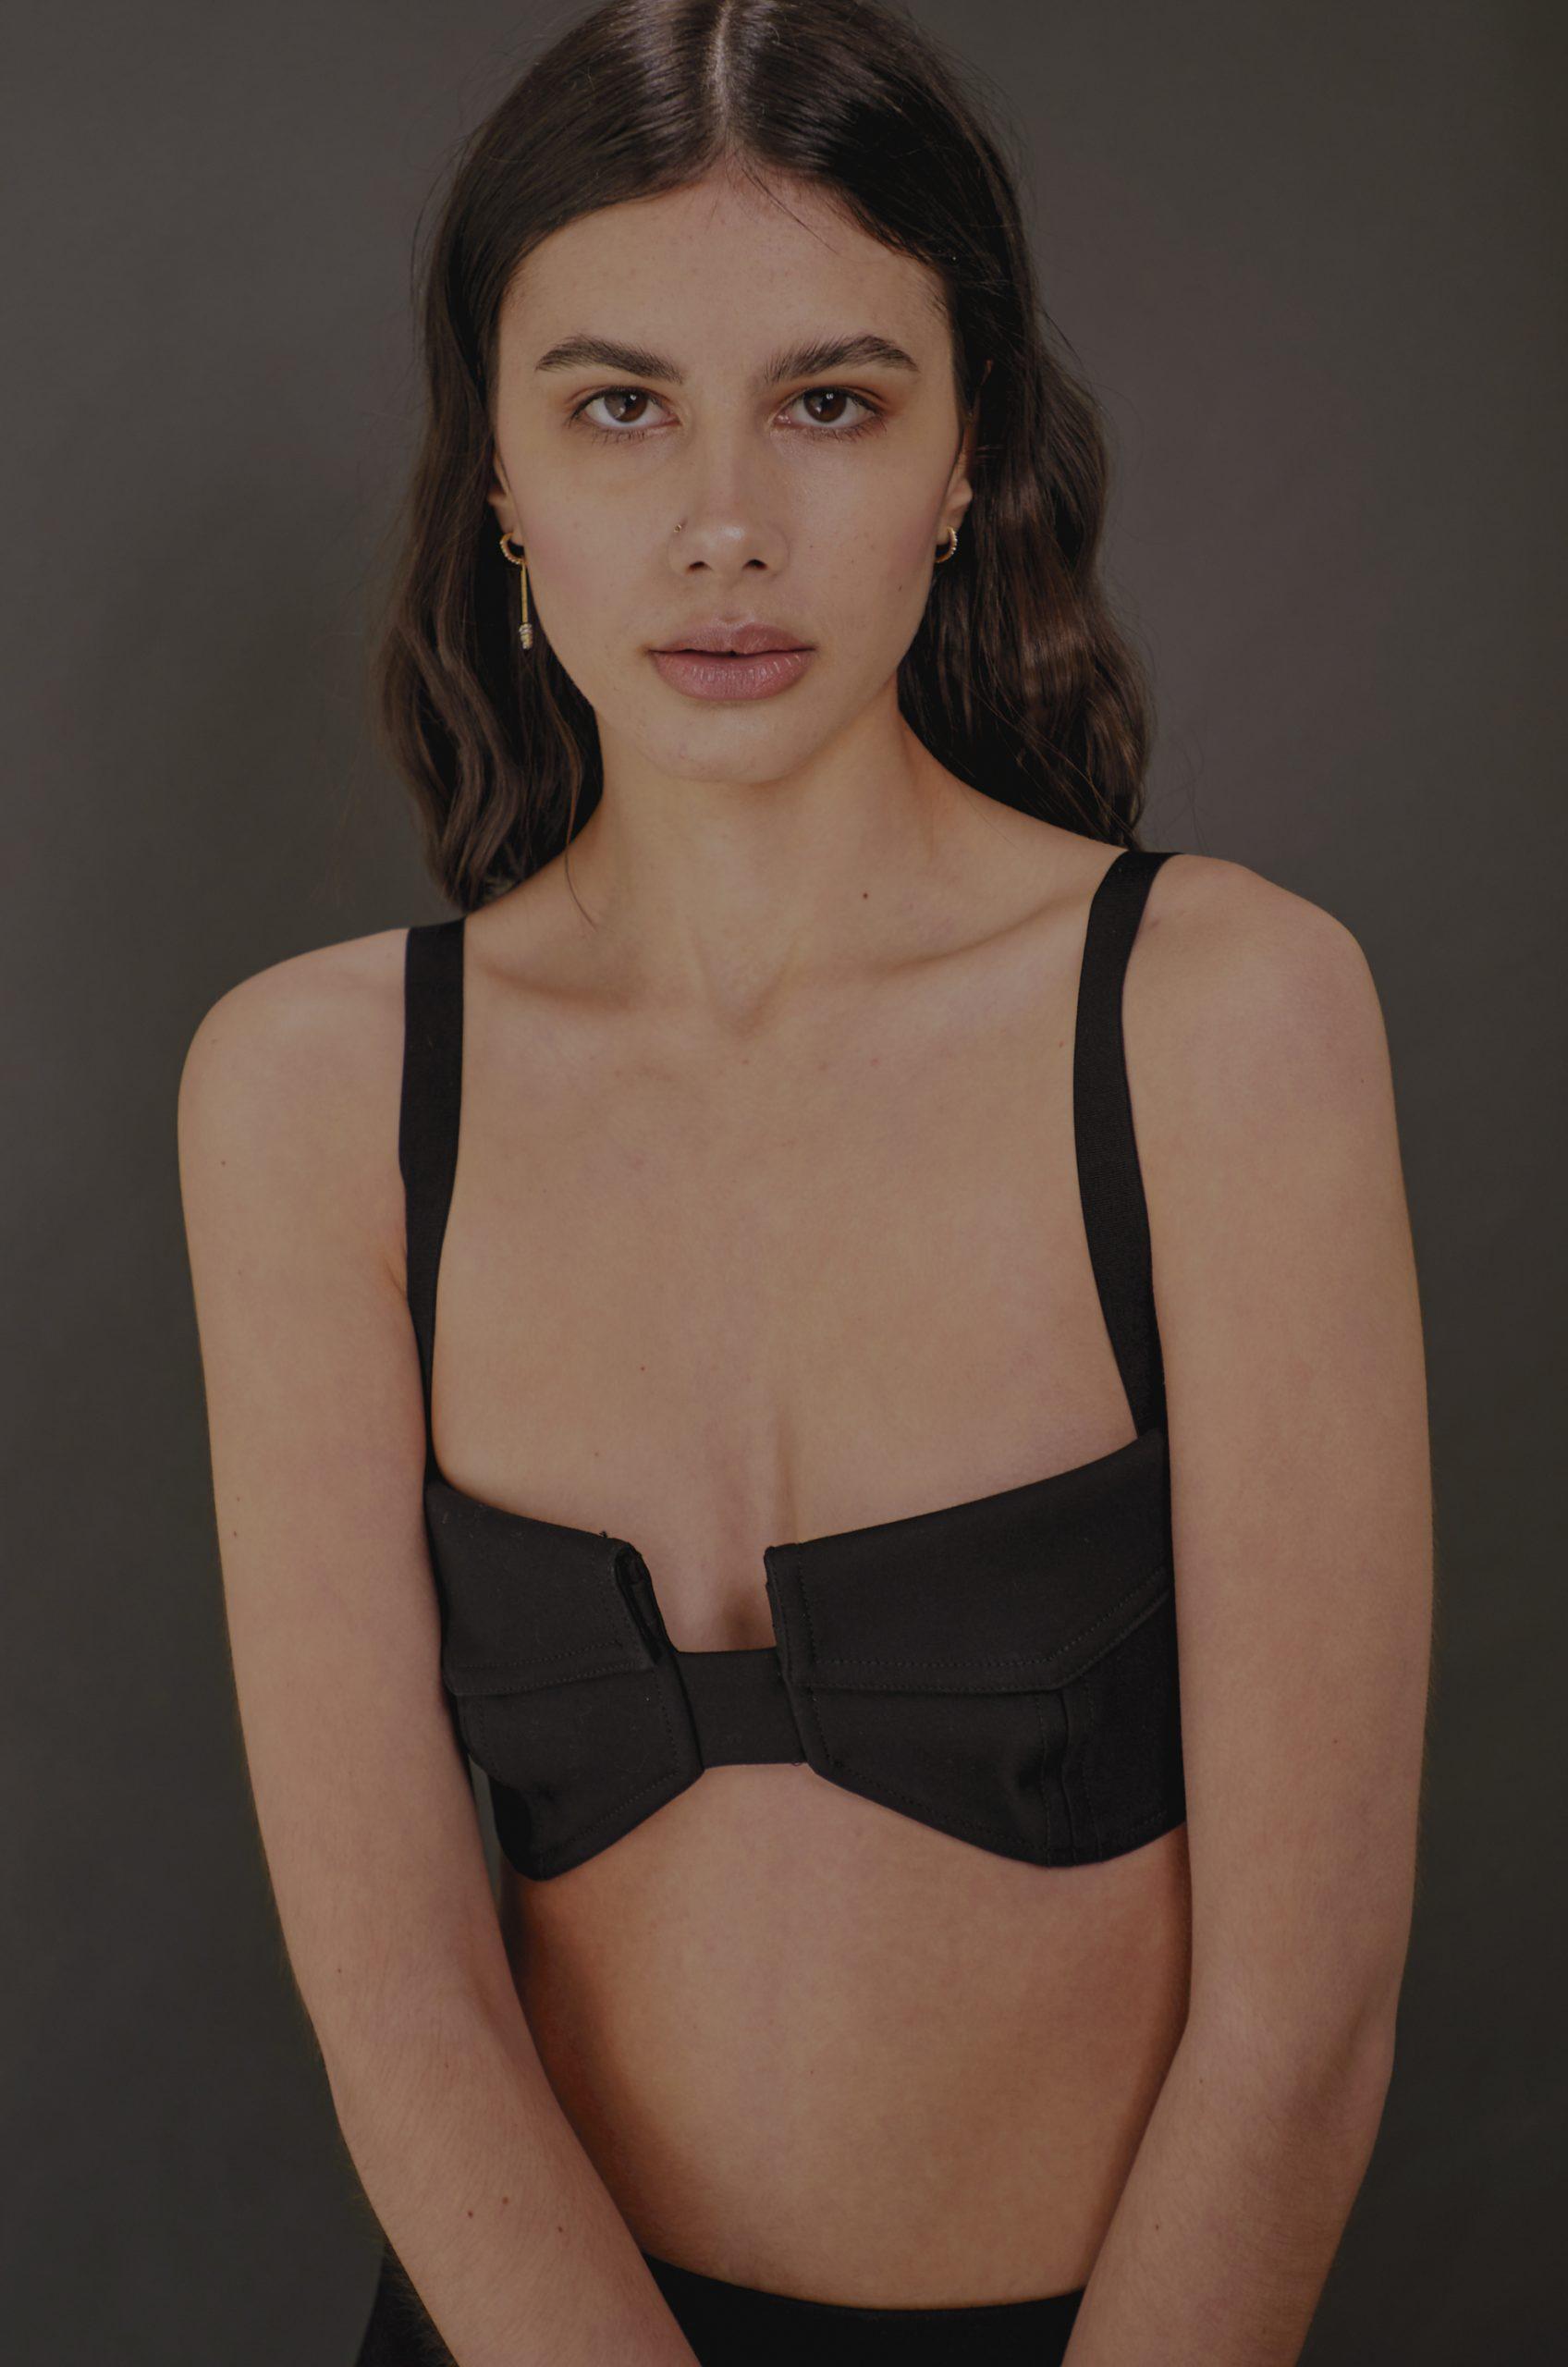 NEUE model Monique Lane wearing Dion Lee by Aaron VIII